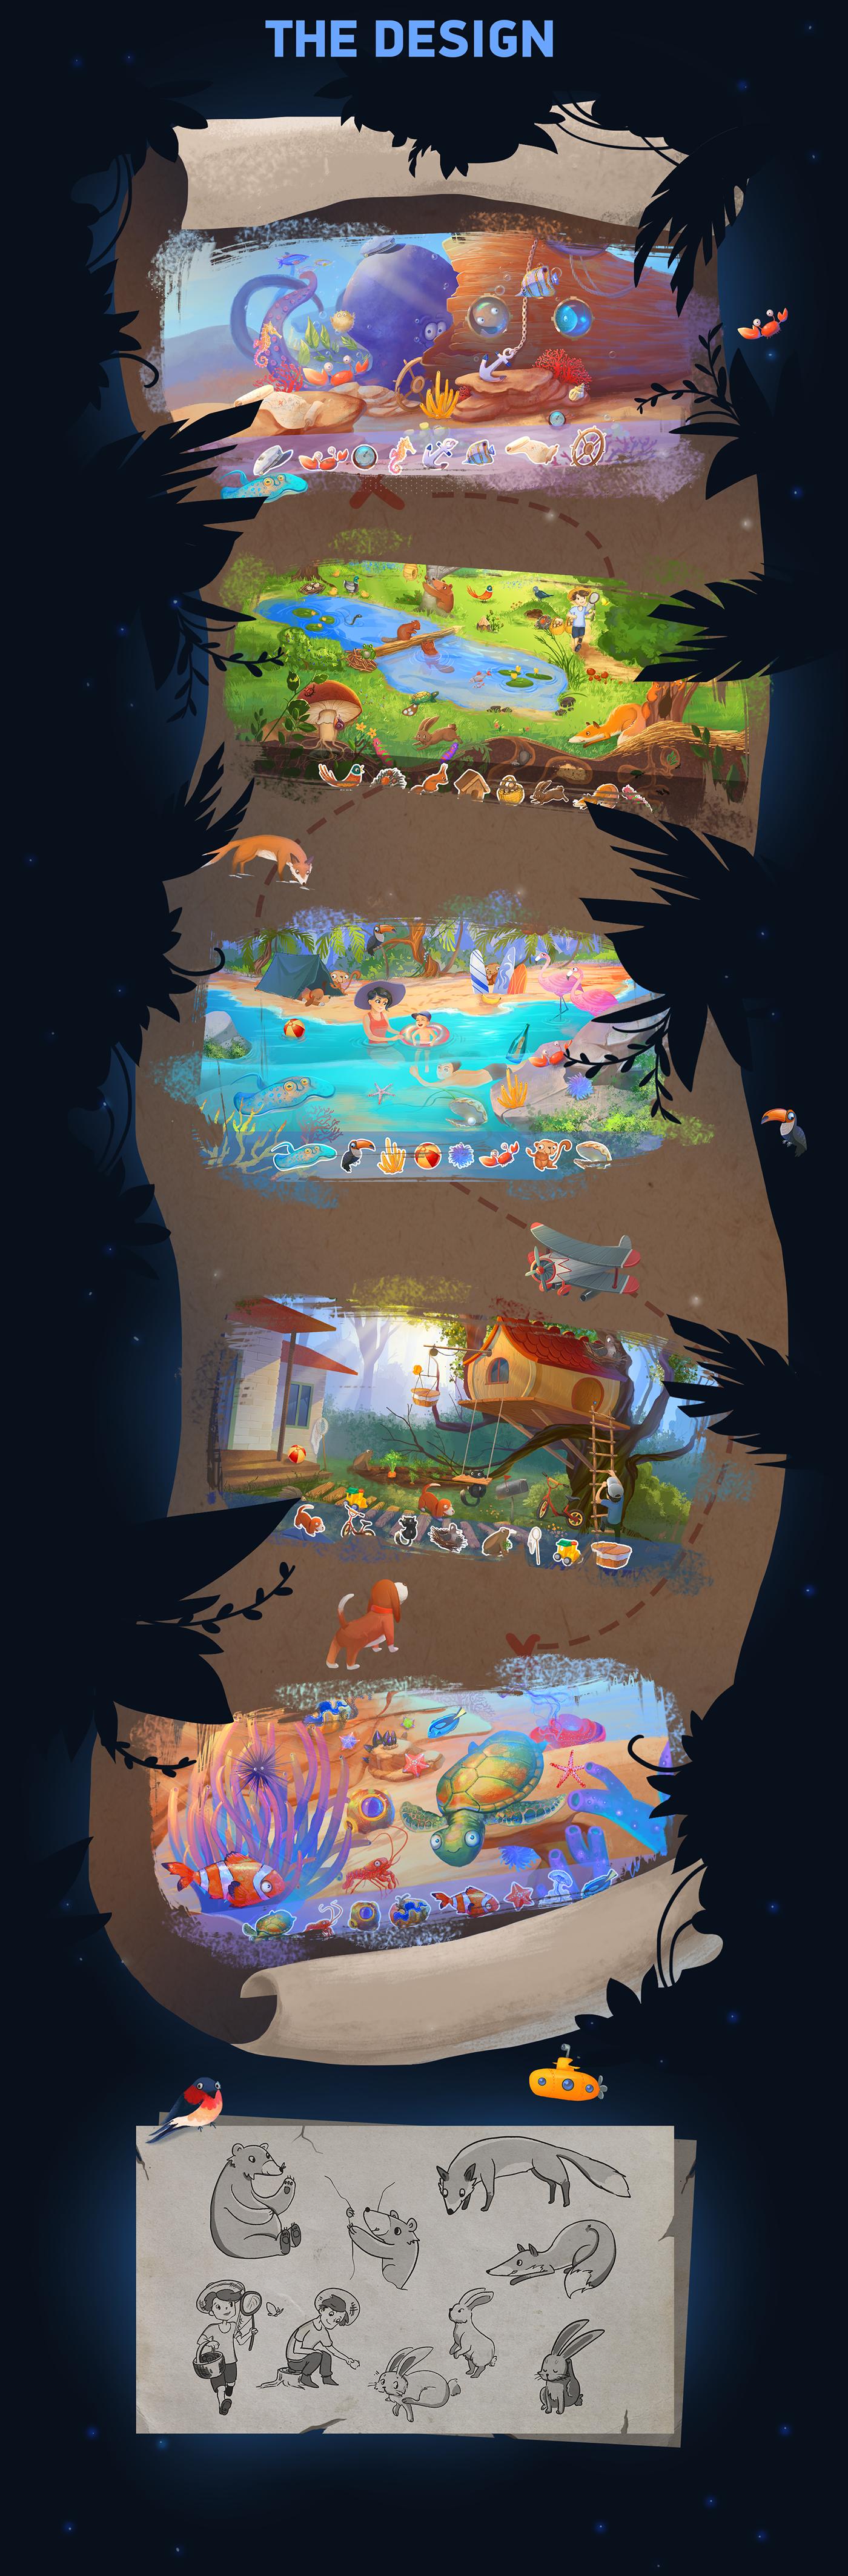 Game Development ILLUSTRATION  hound studio game design  2D art